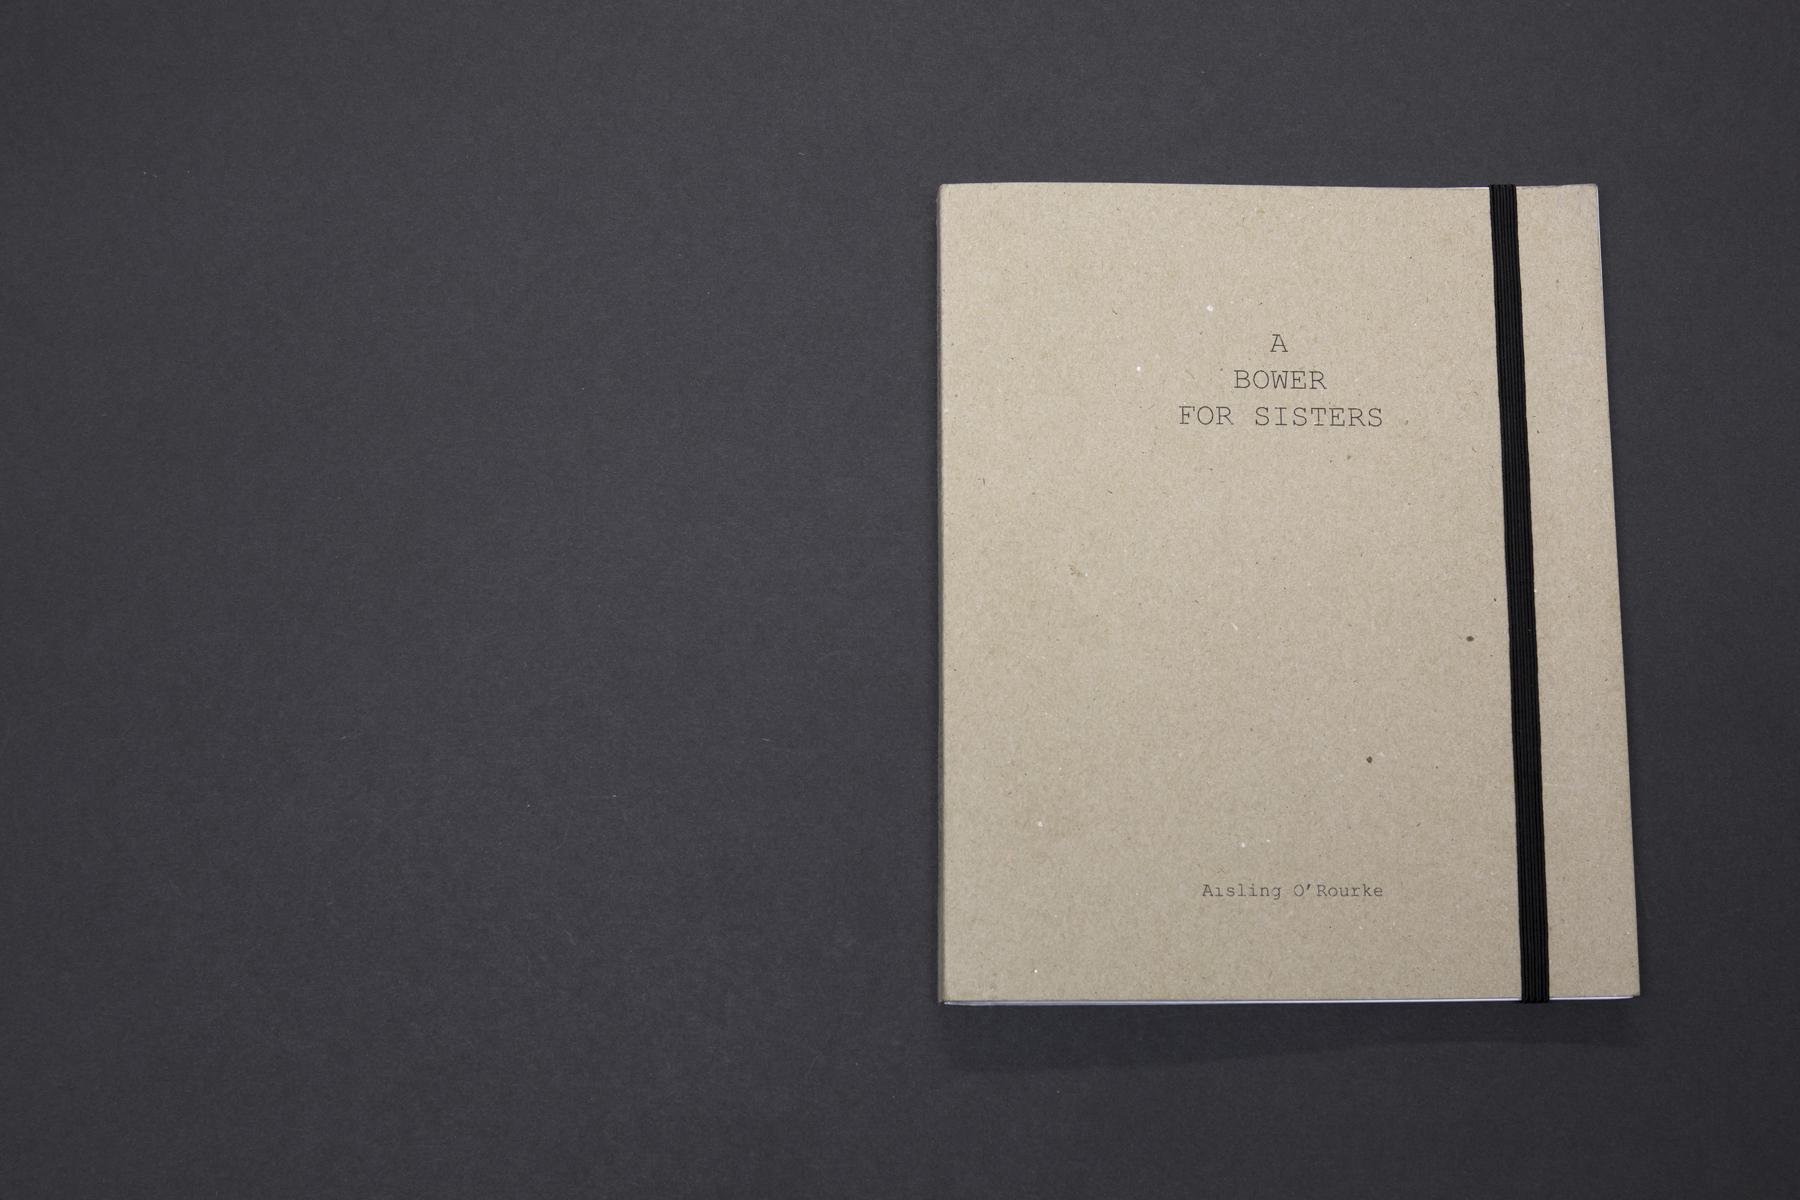 abowerforsisters-book-7.jpg